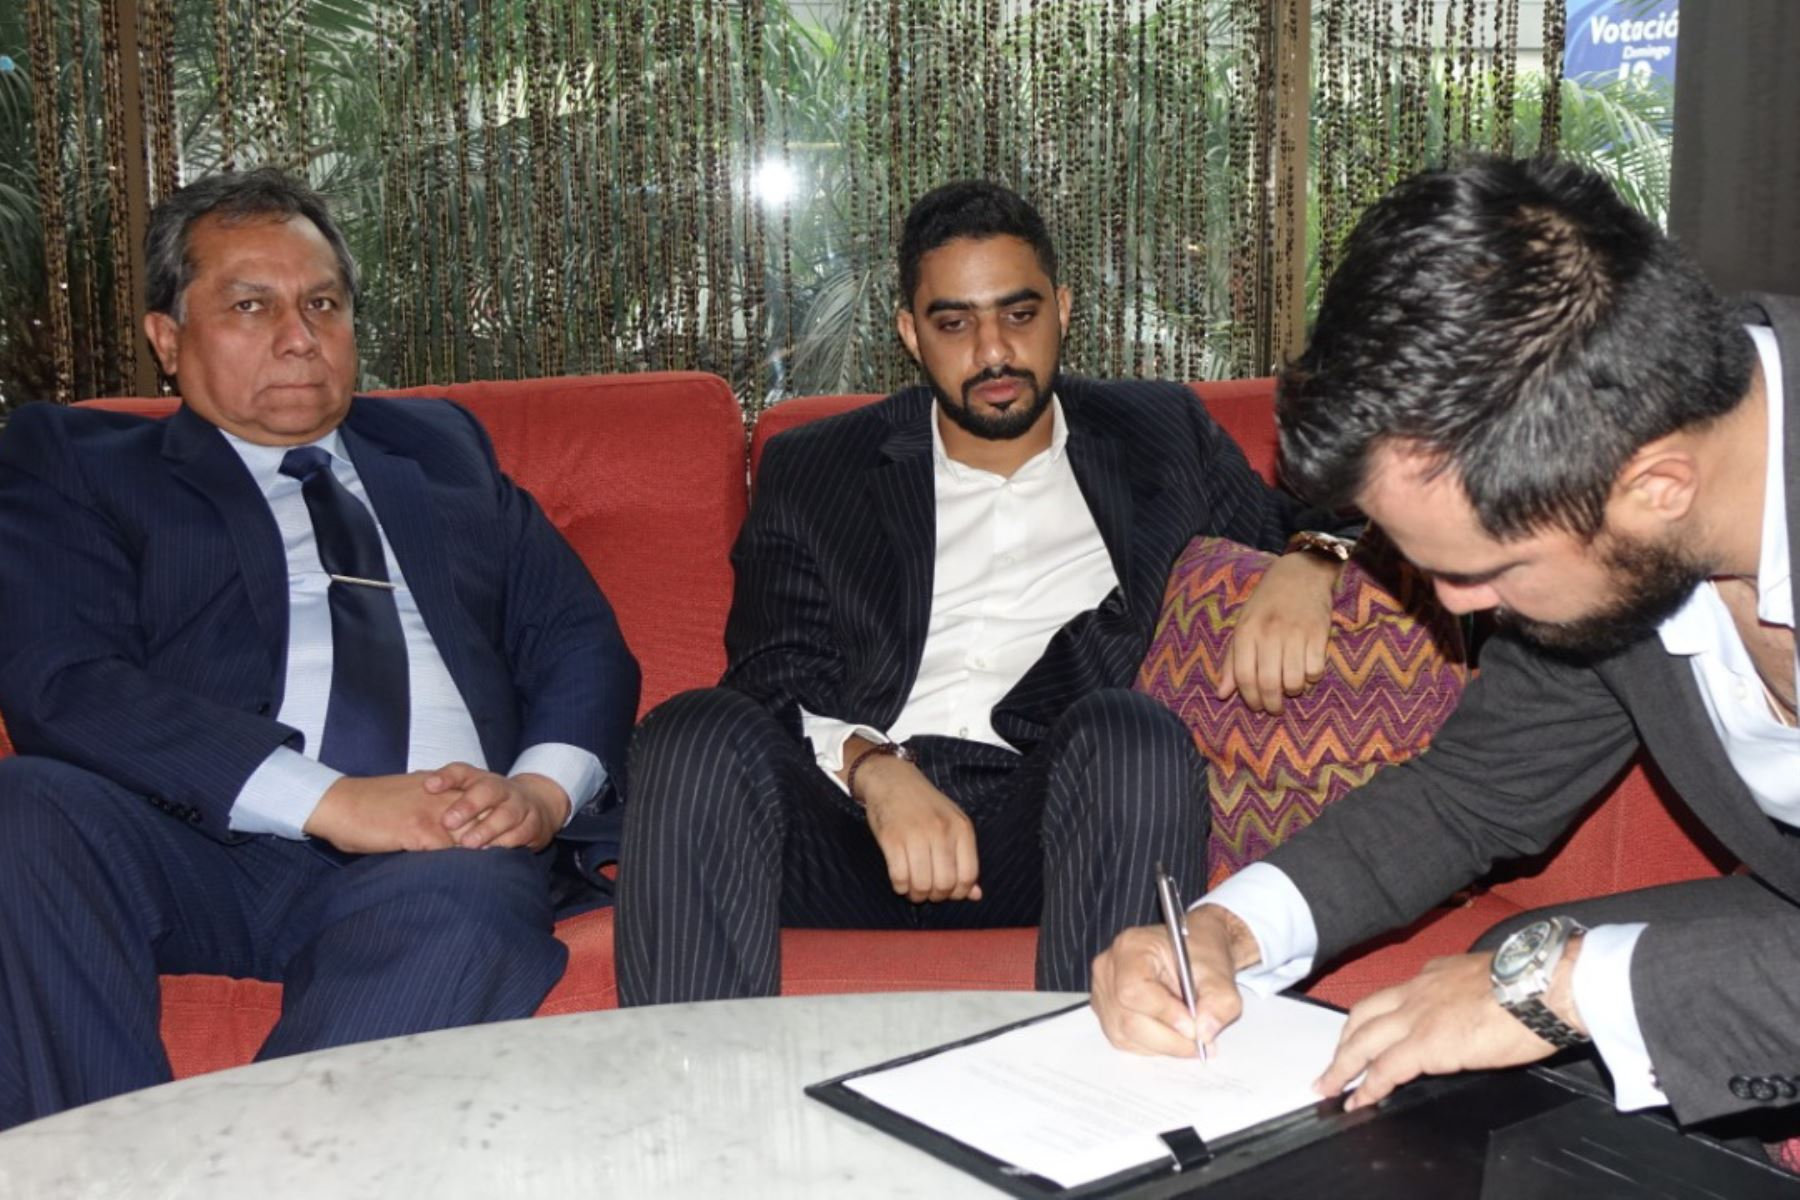 Viceministro de Gestión Institucional del Minedu, Guido Rospigliosi, se reunió con empresario árabe Yaqoob Mubarak para oficializar donación. ANDINA/Difusión